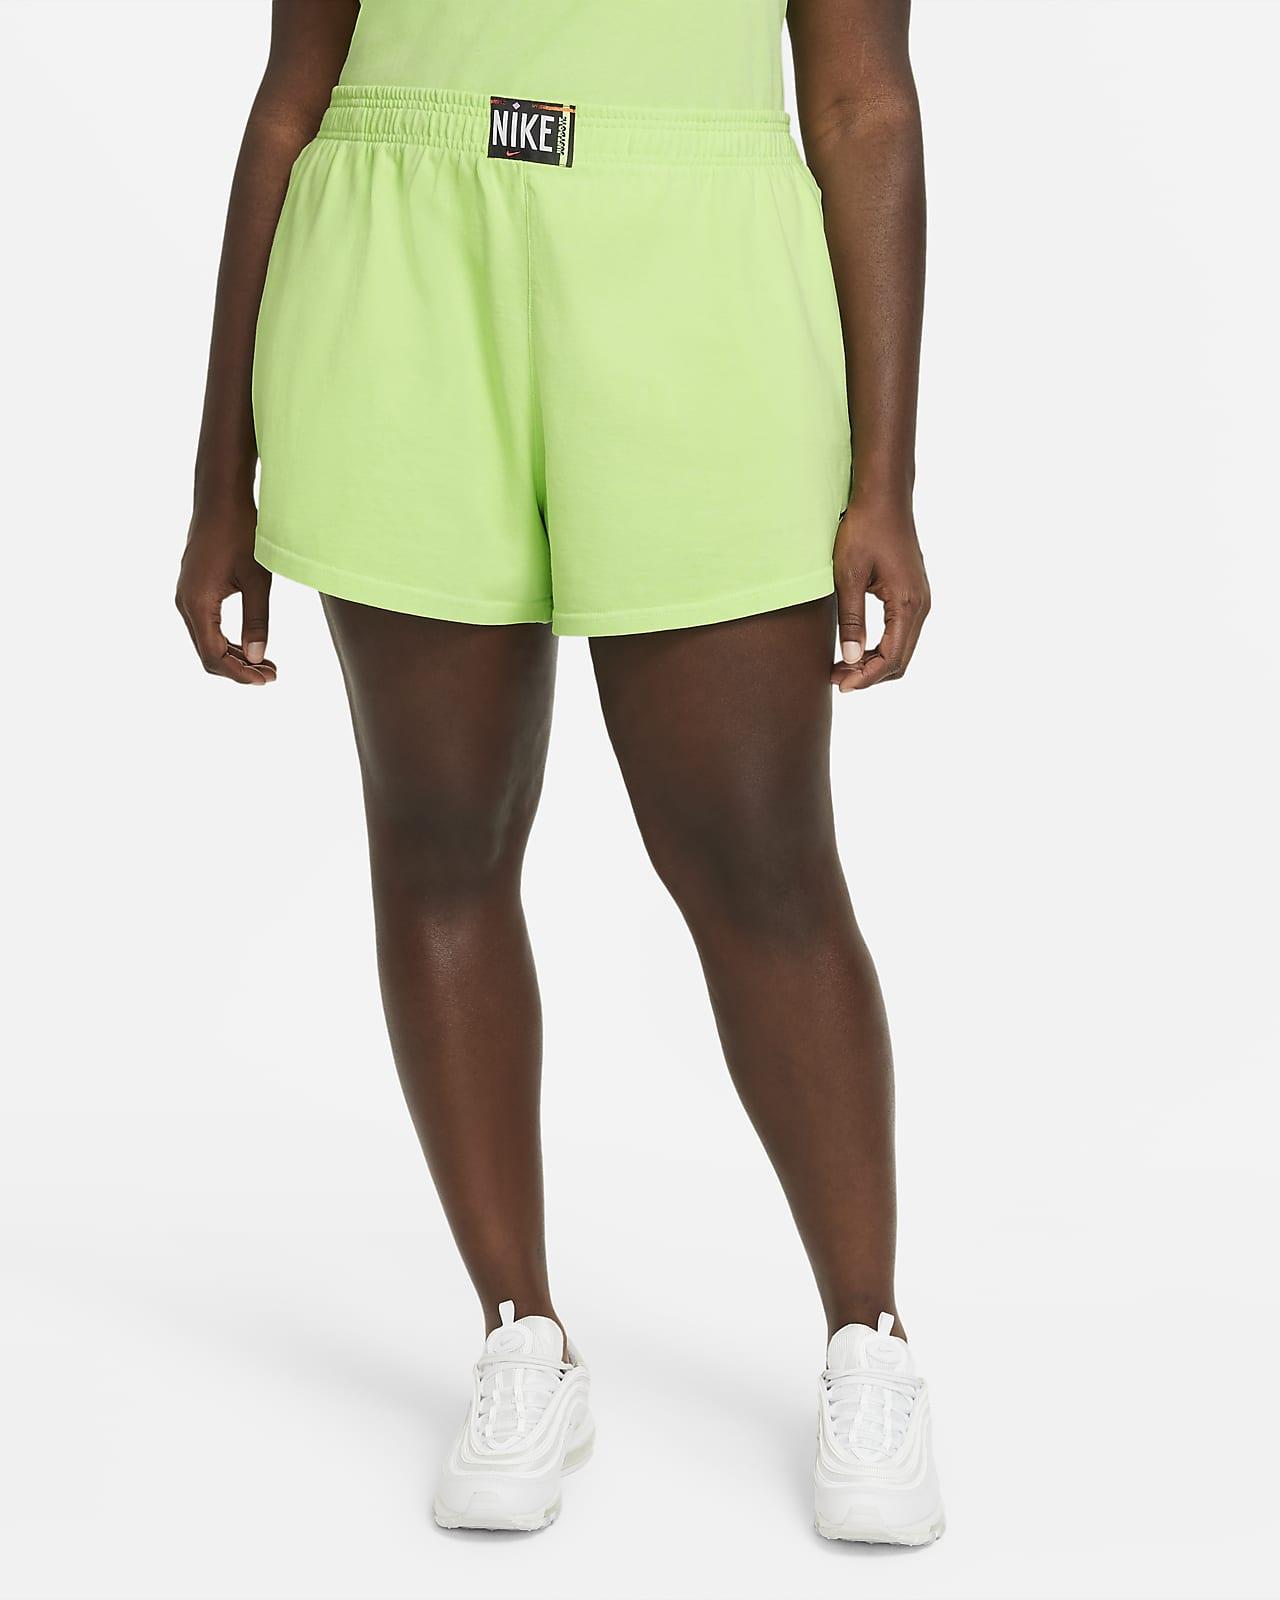 Nike Sportswear Women's Washed Shorts (Plus Size)